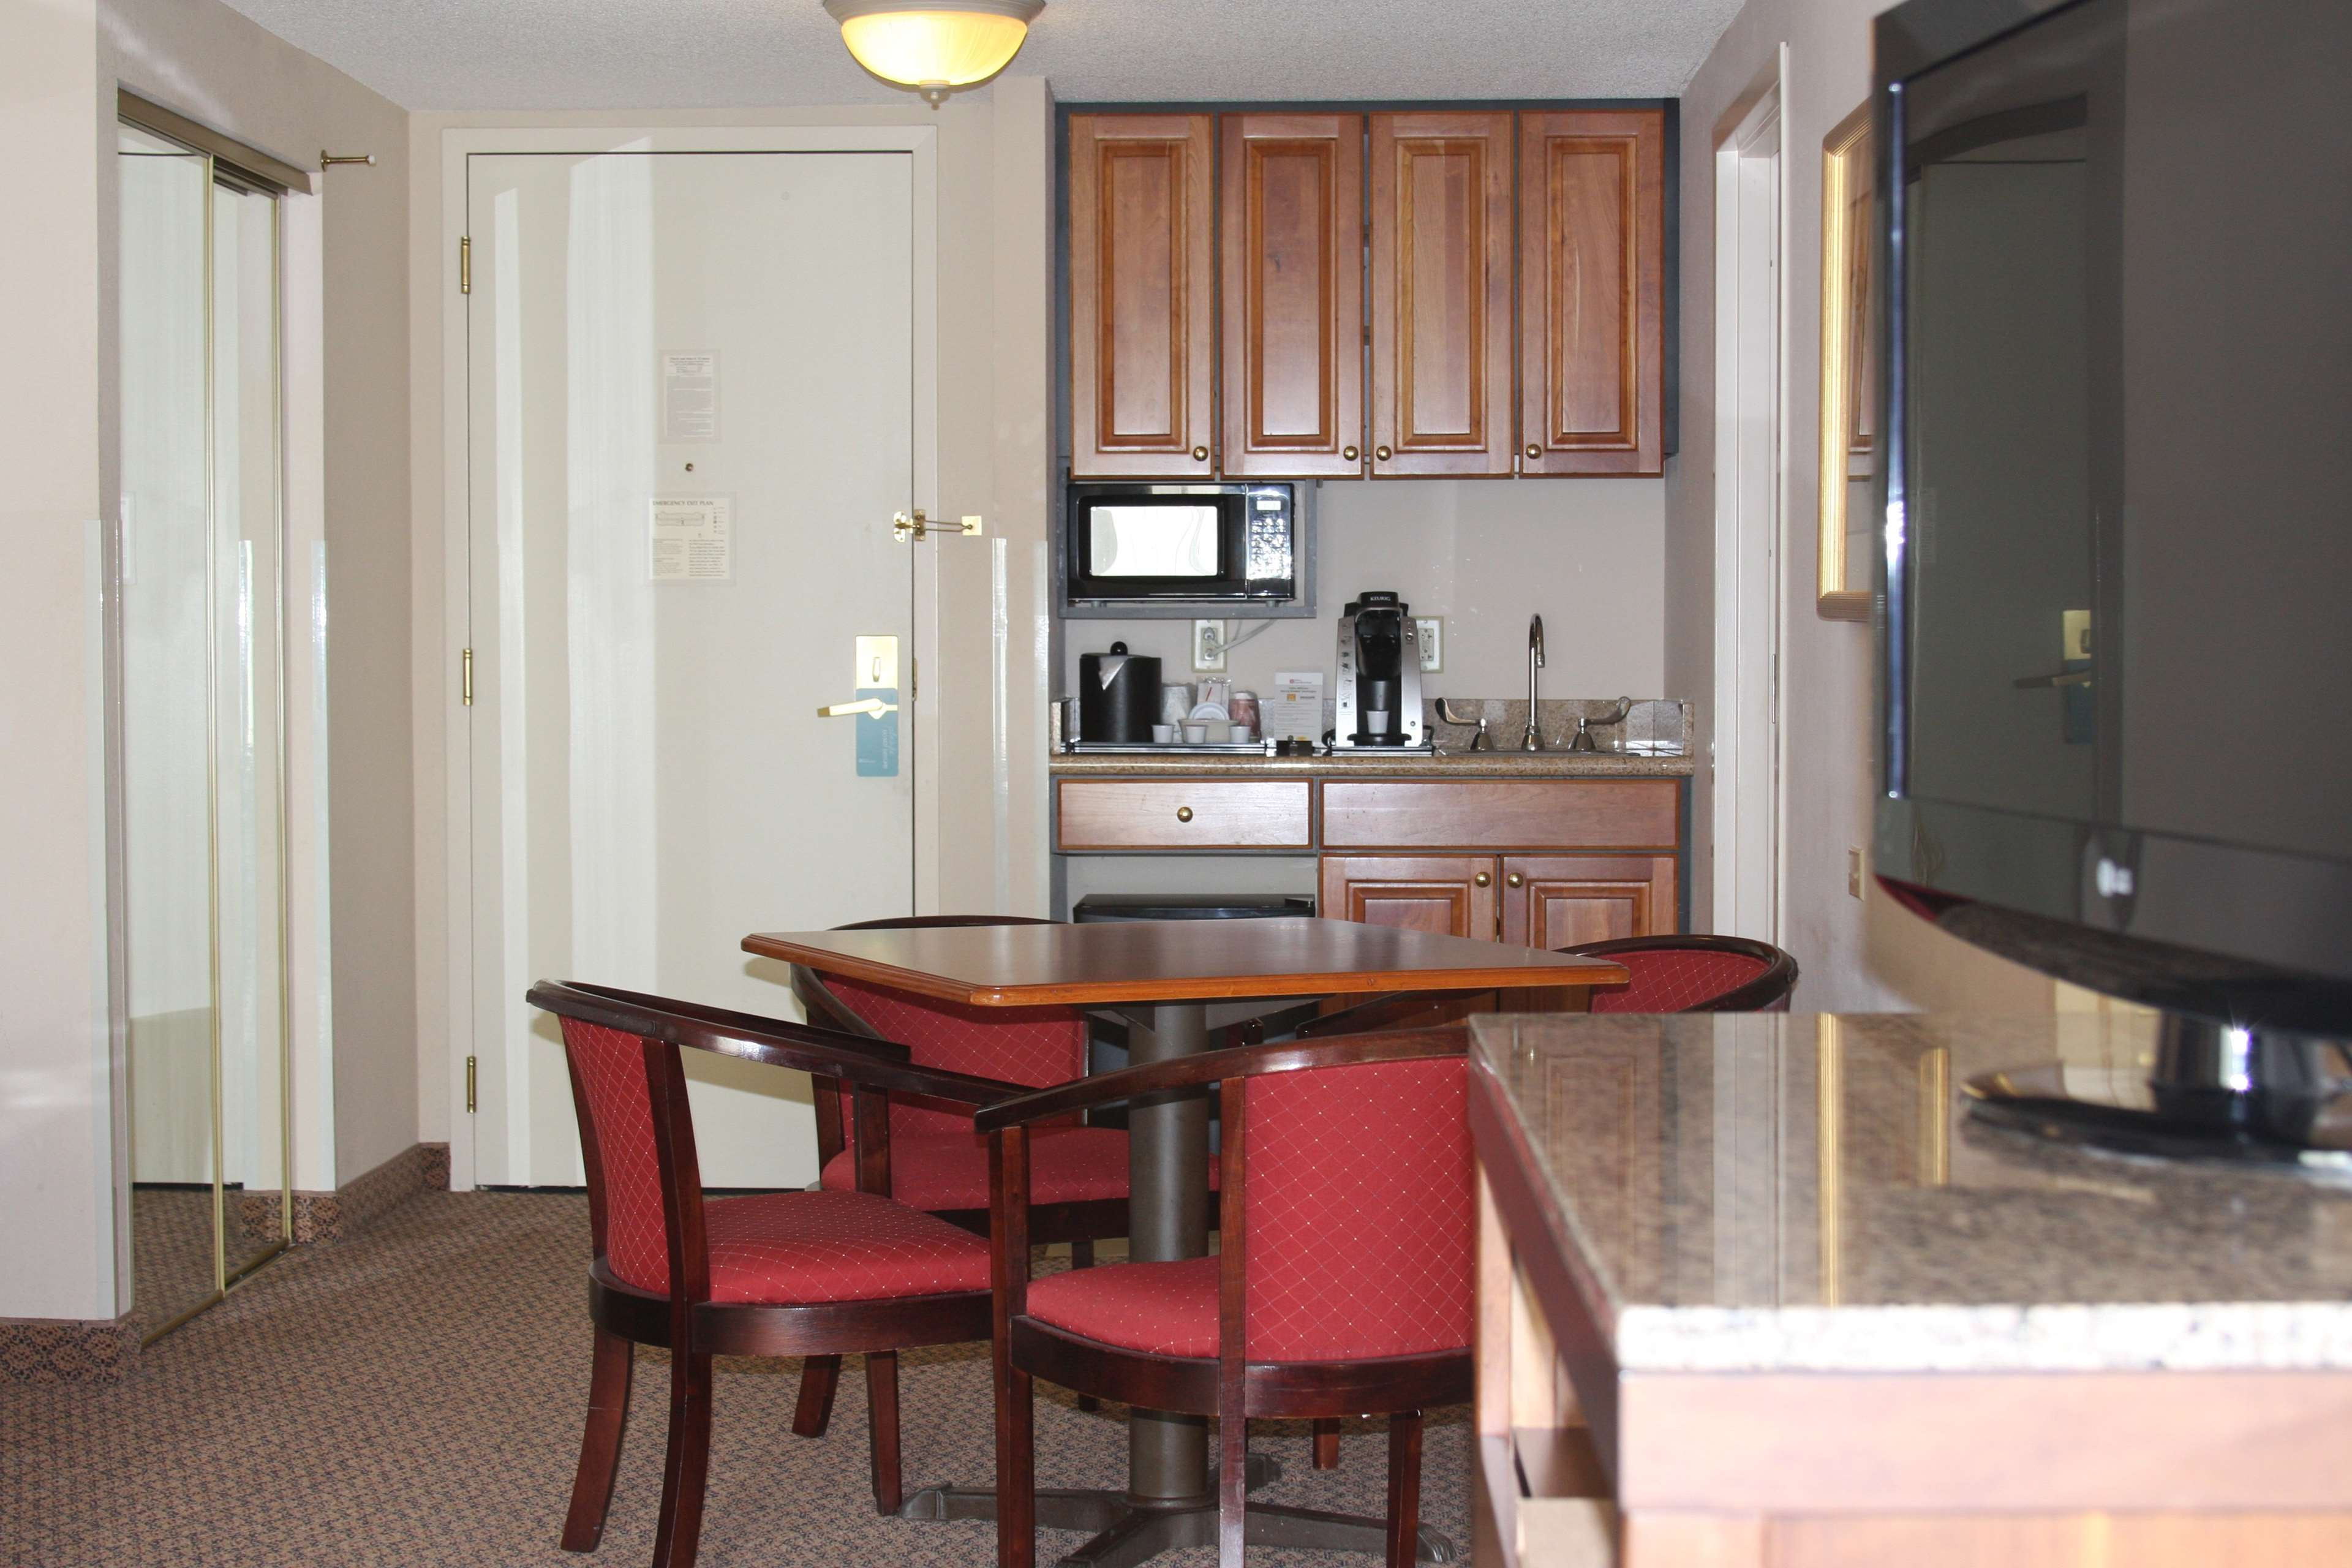 Hilton Garden Inn Elmira/Corning image 20